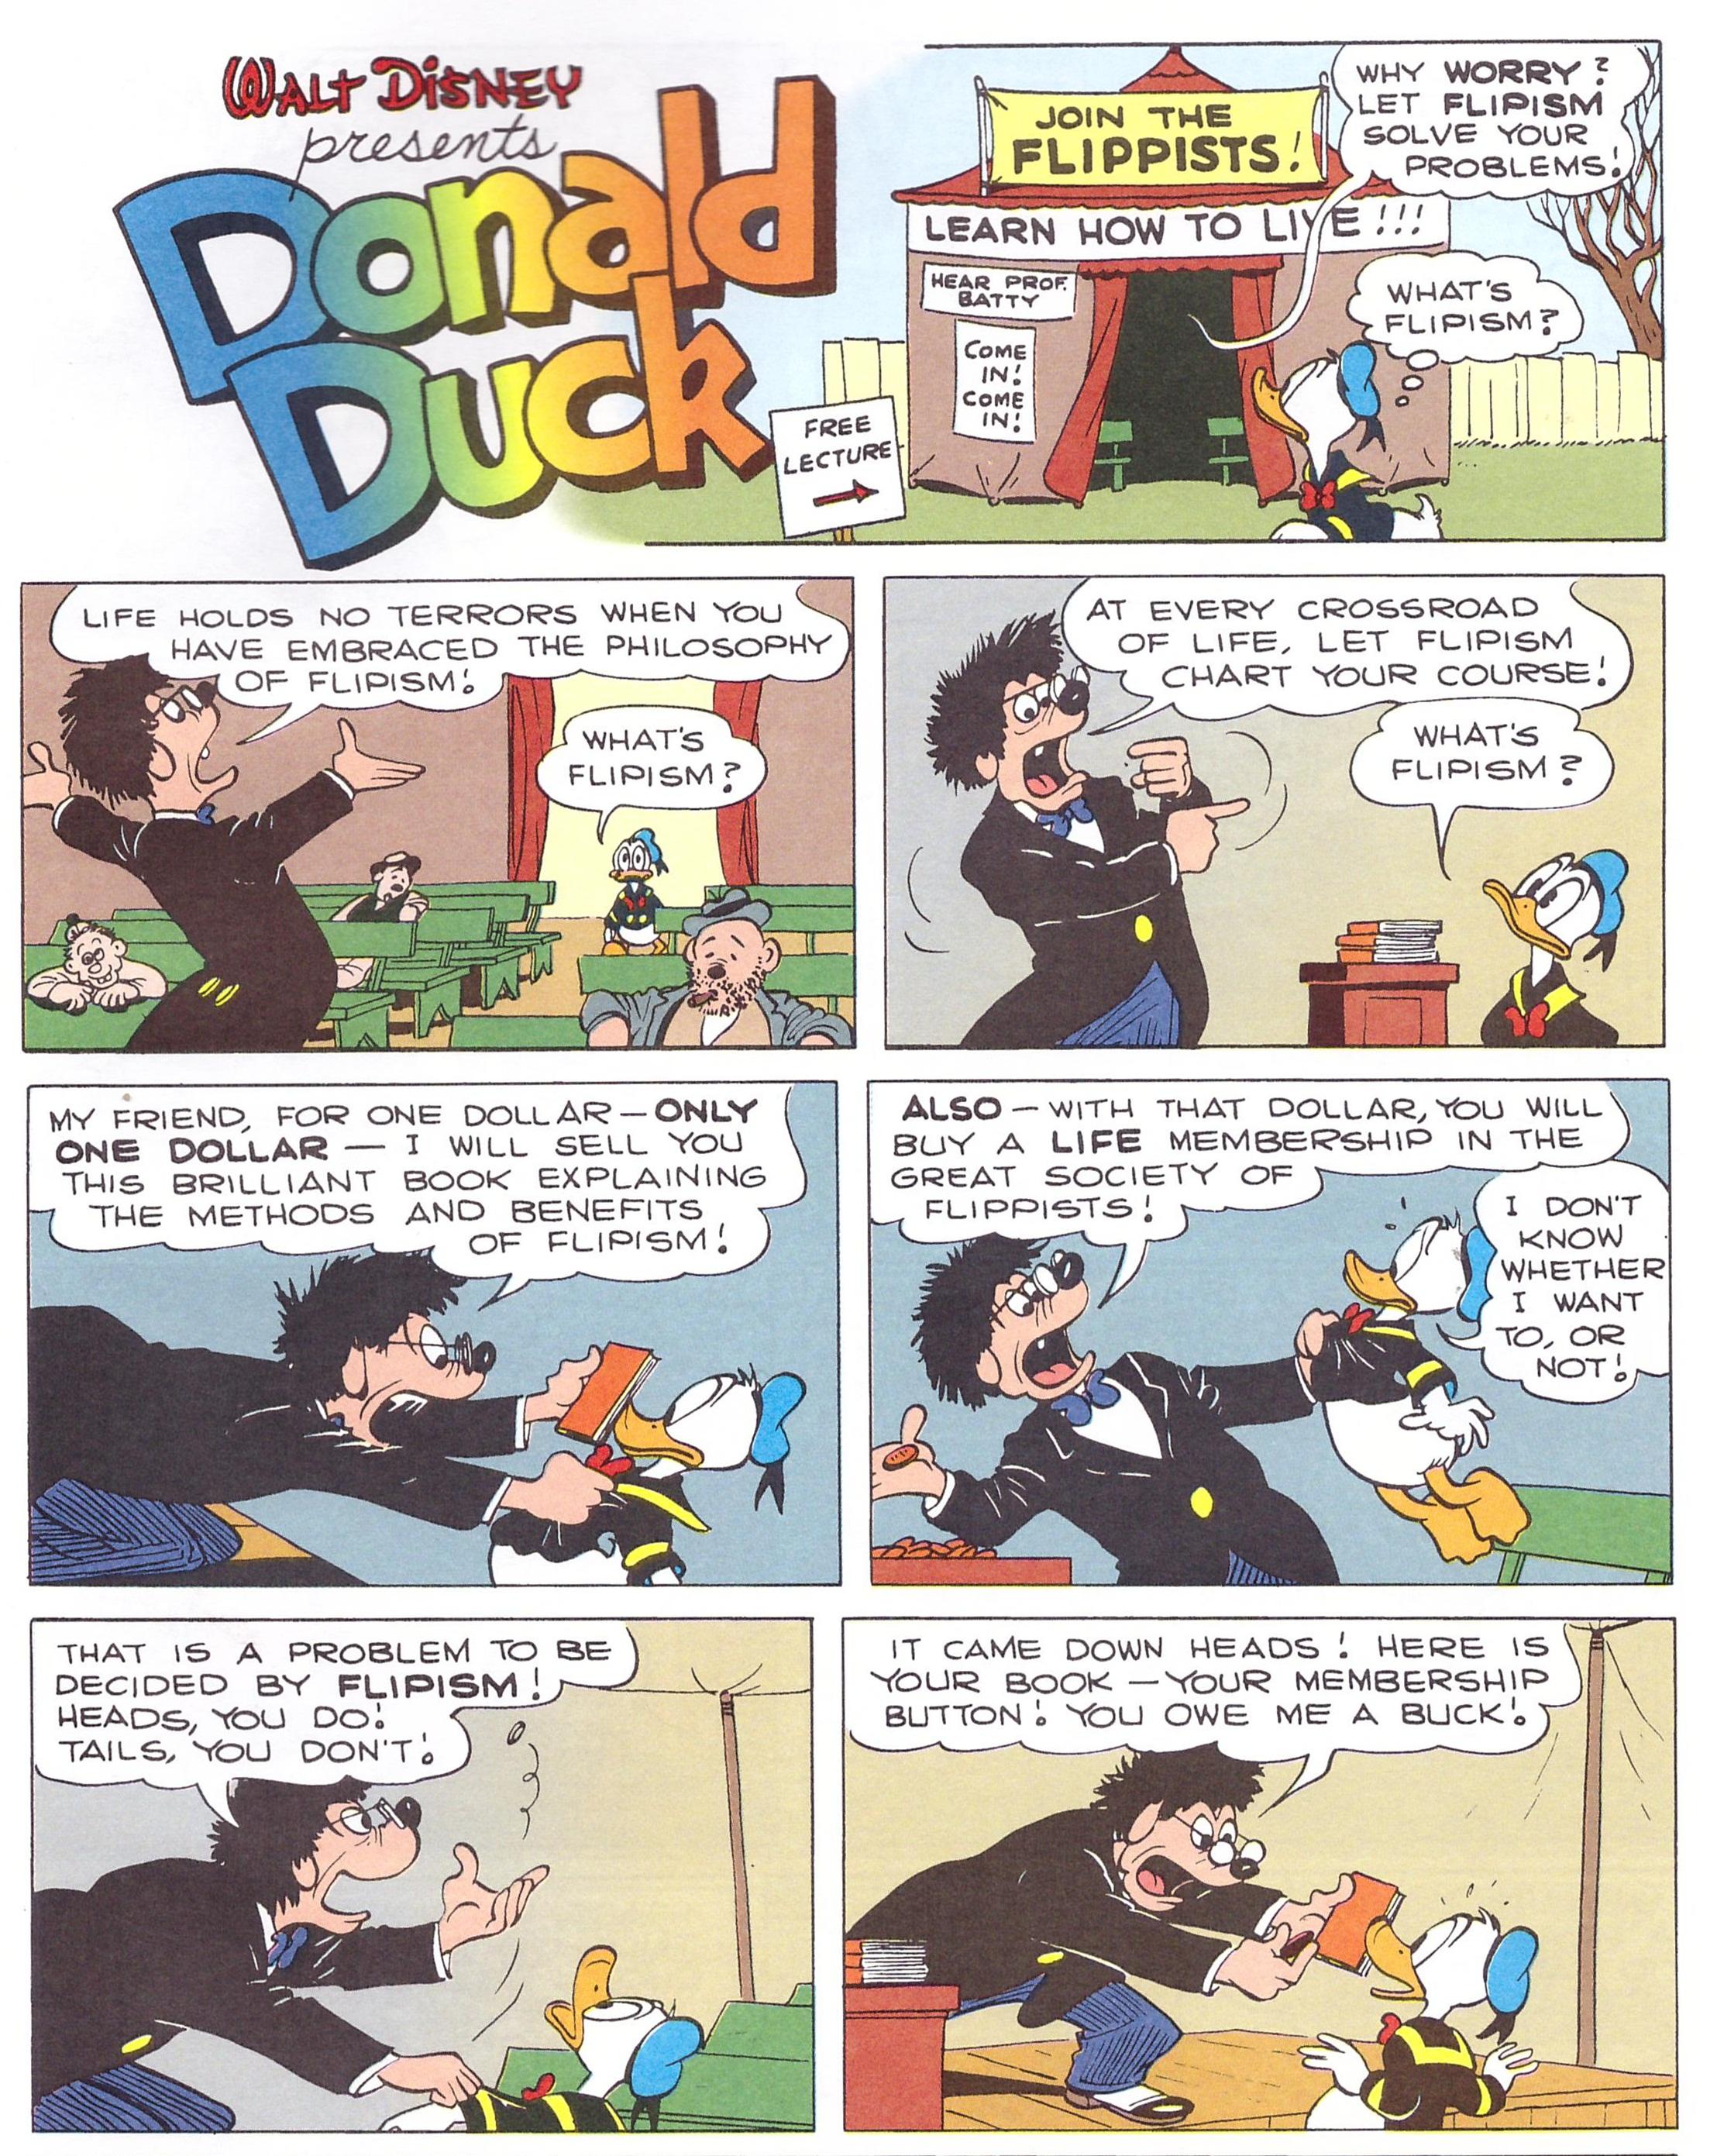 Walt Disney Comics & Stories by Carl Barks 22 review